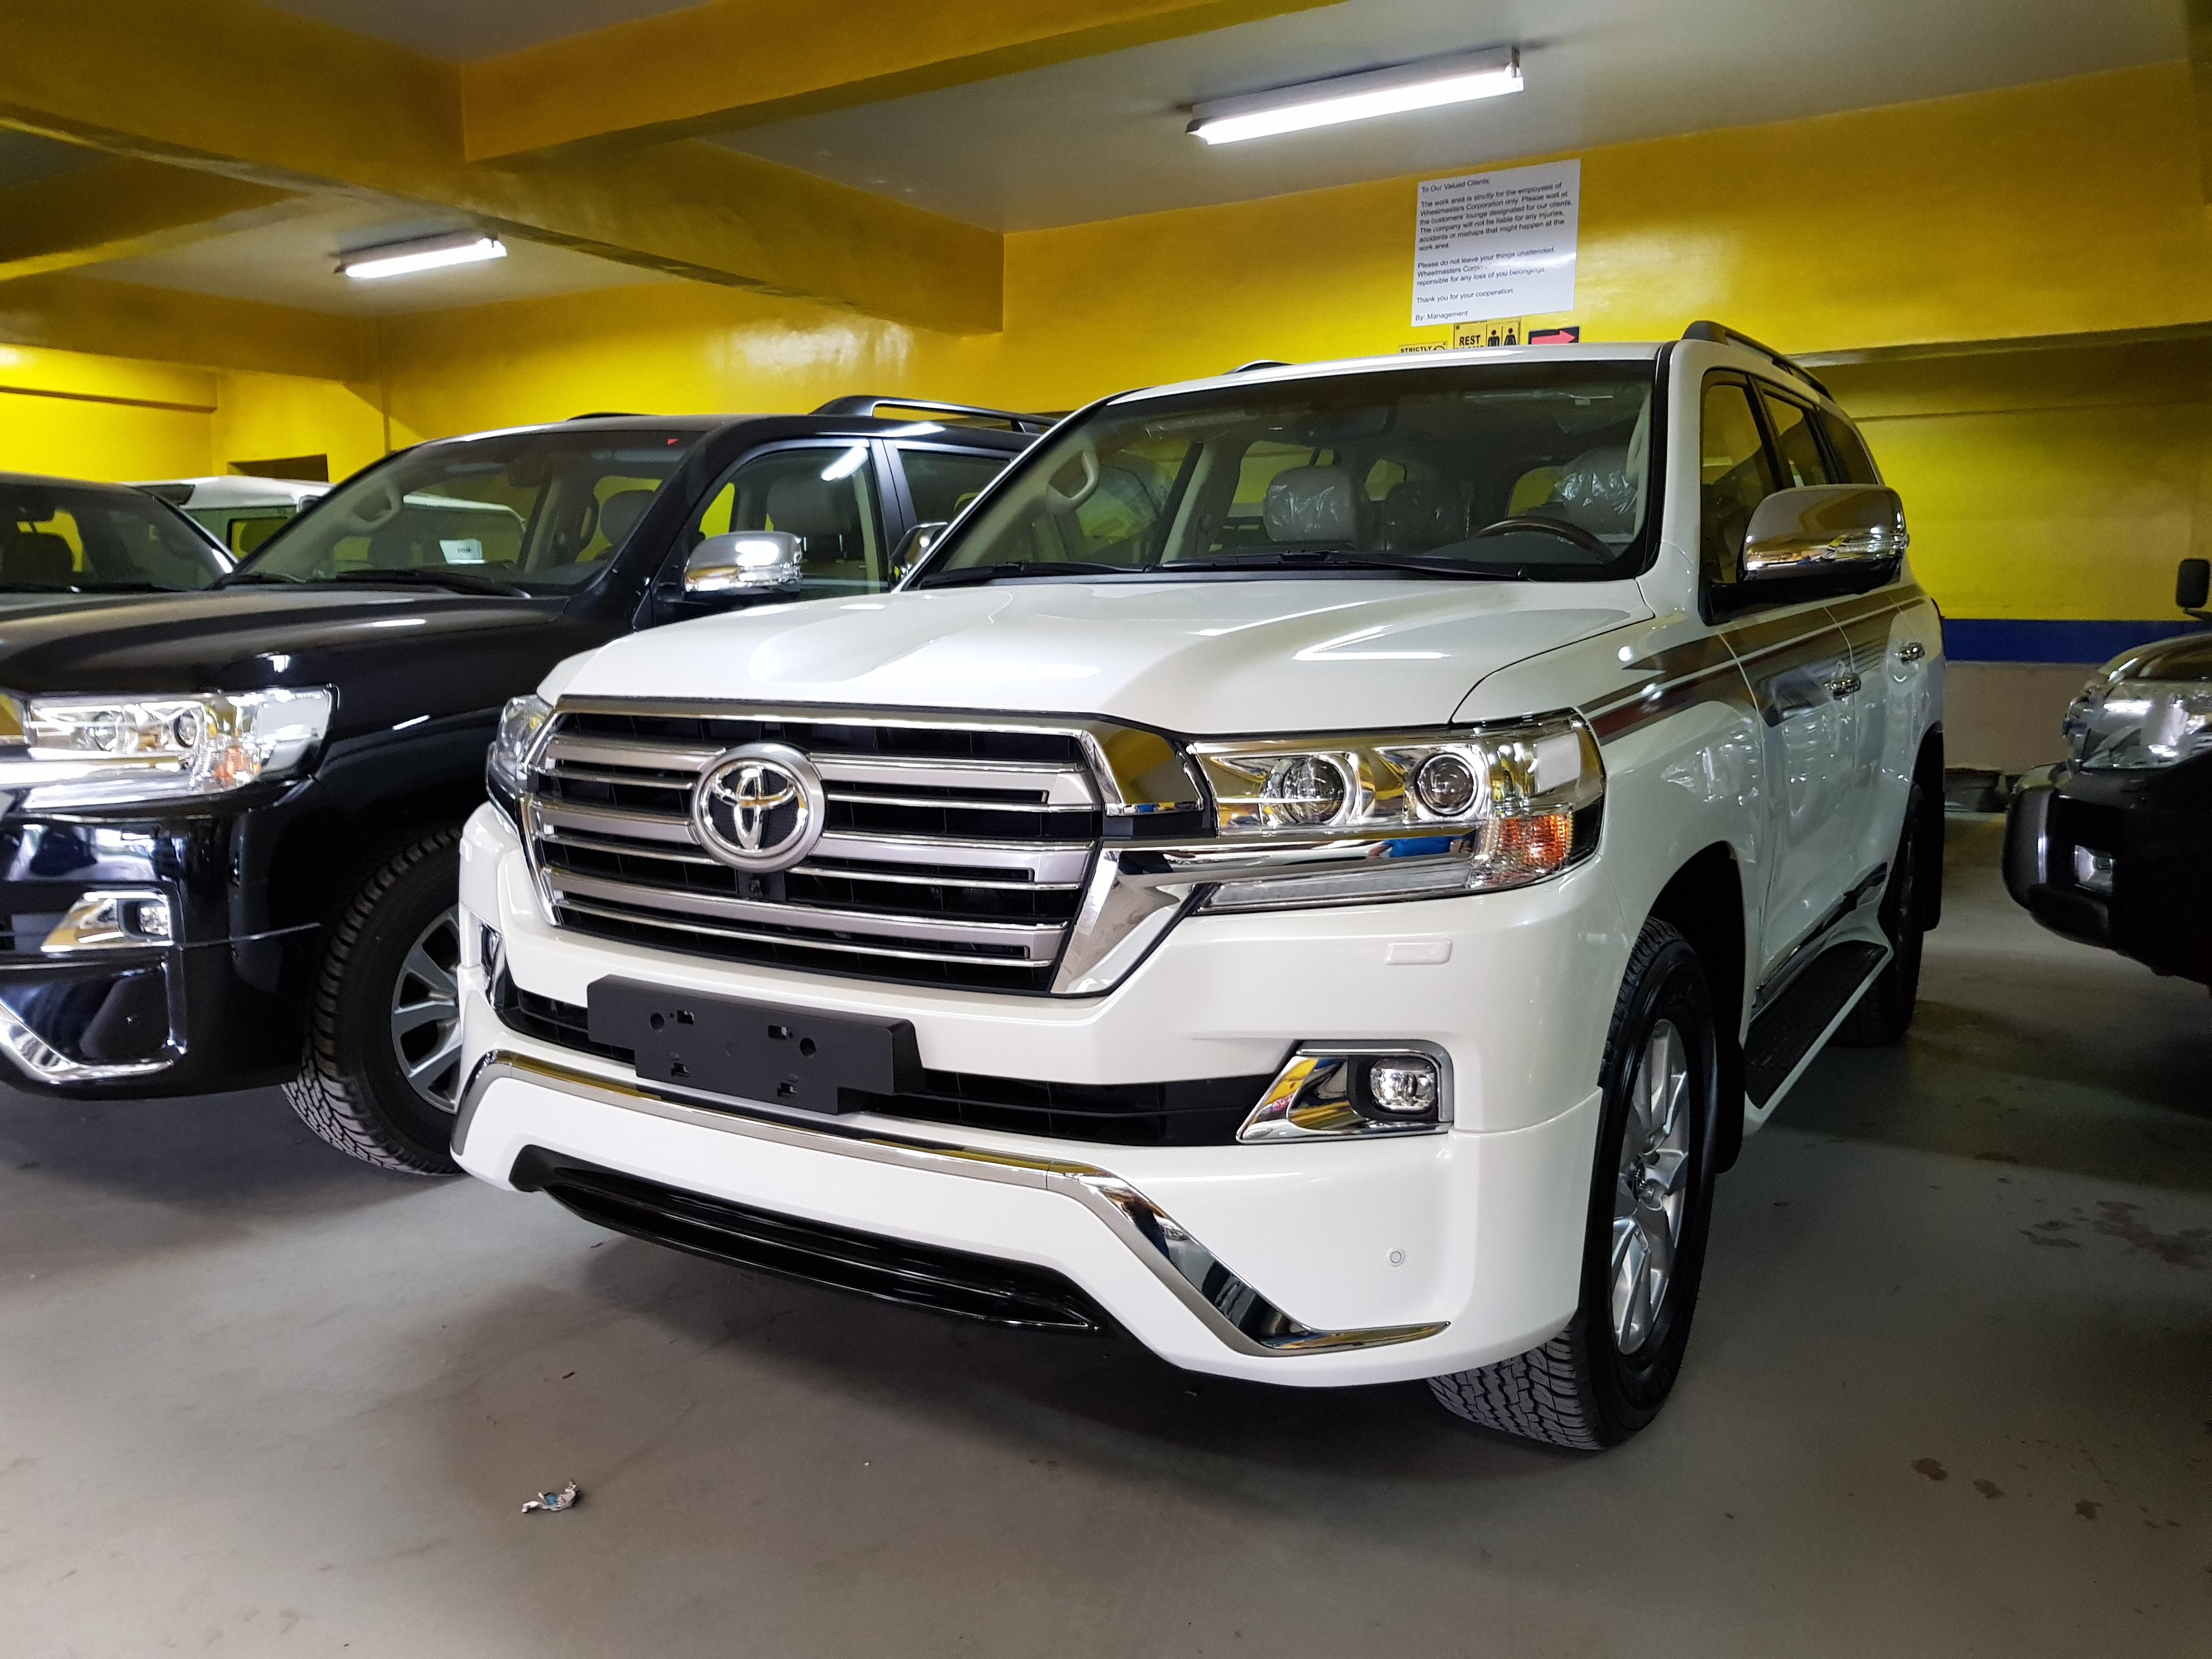 Drive preview: 2018 Toyota Land Cruiser 200 series Dubai version | Carl Cabusas